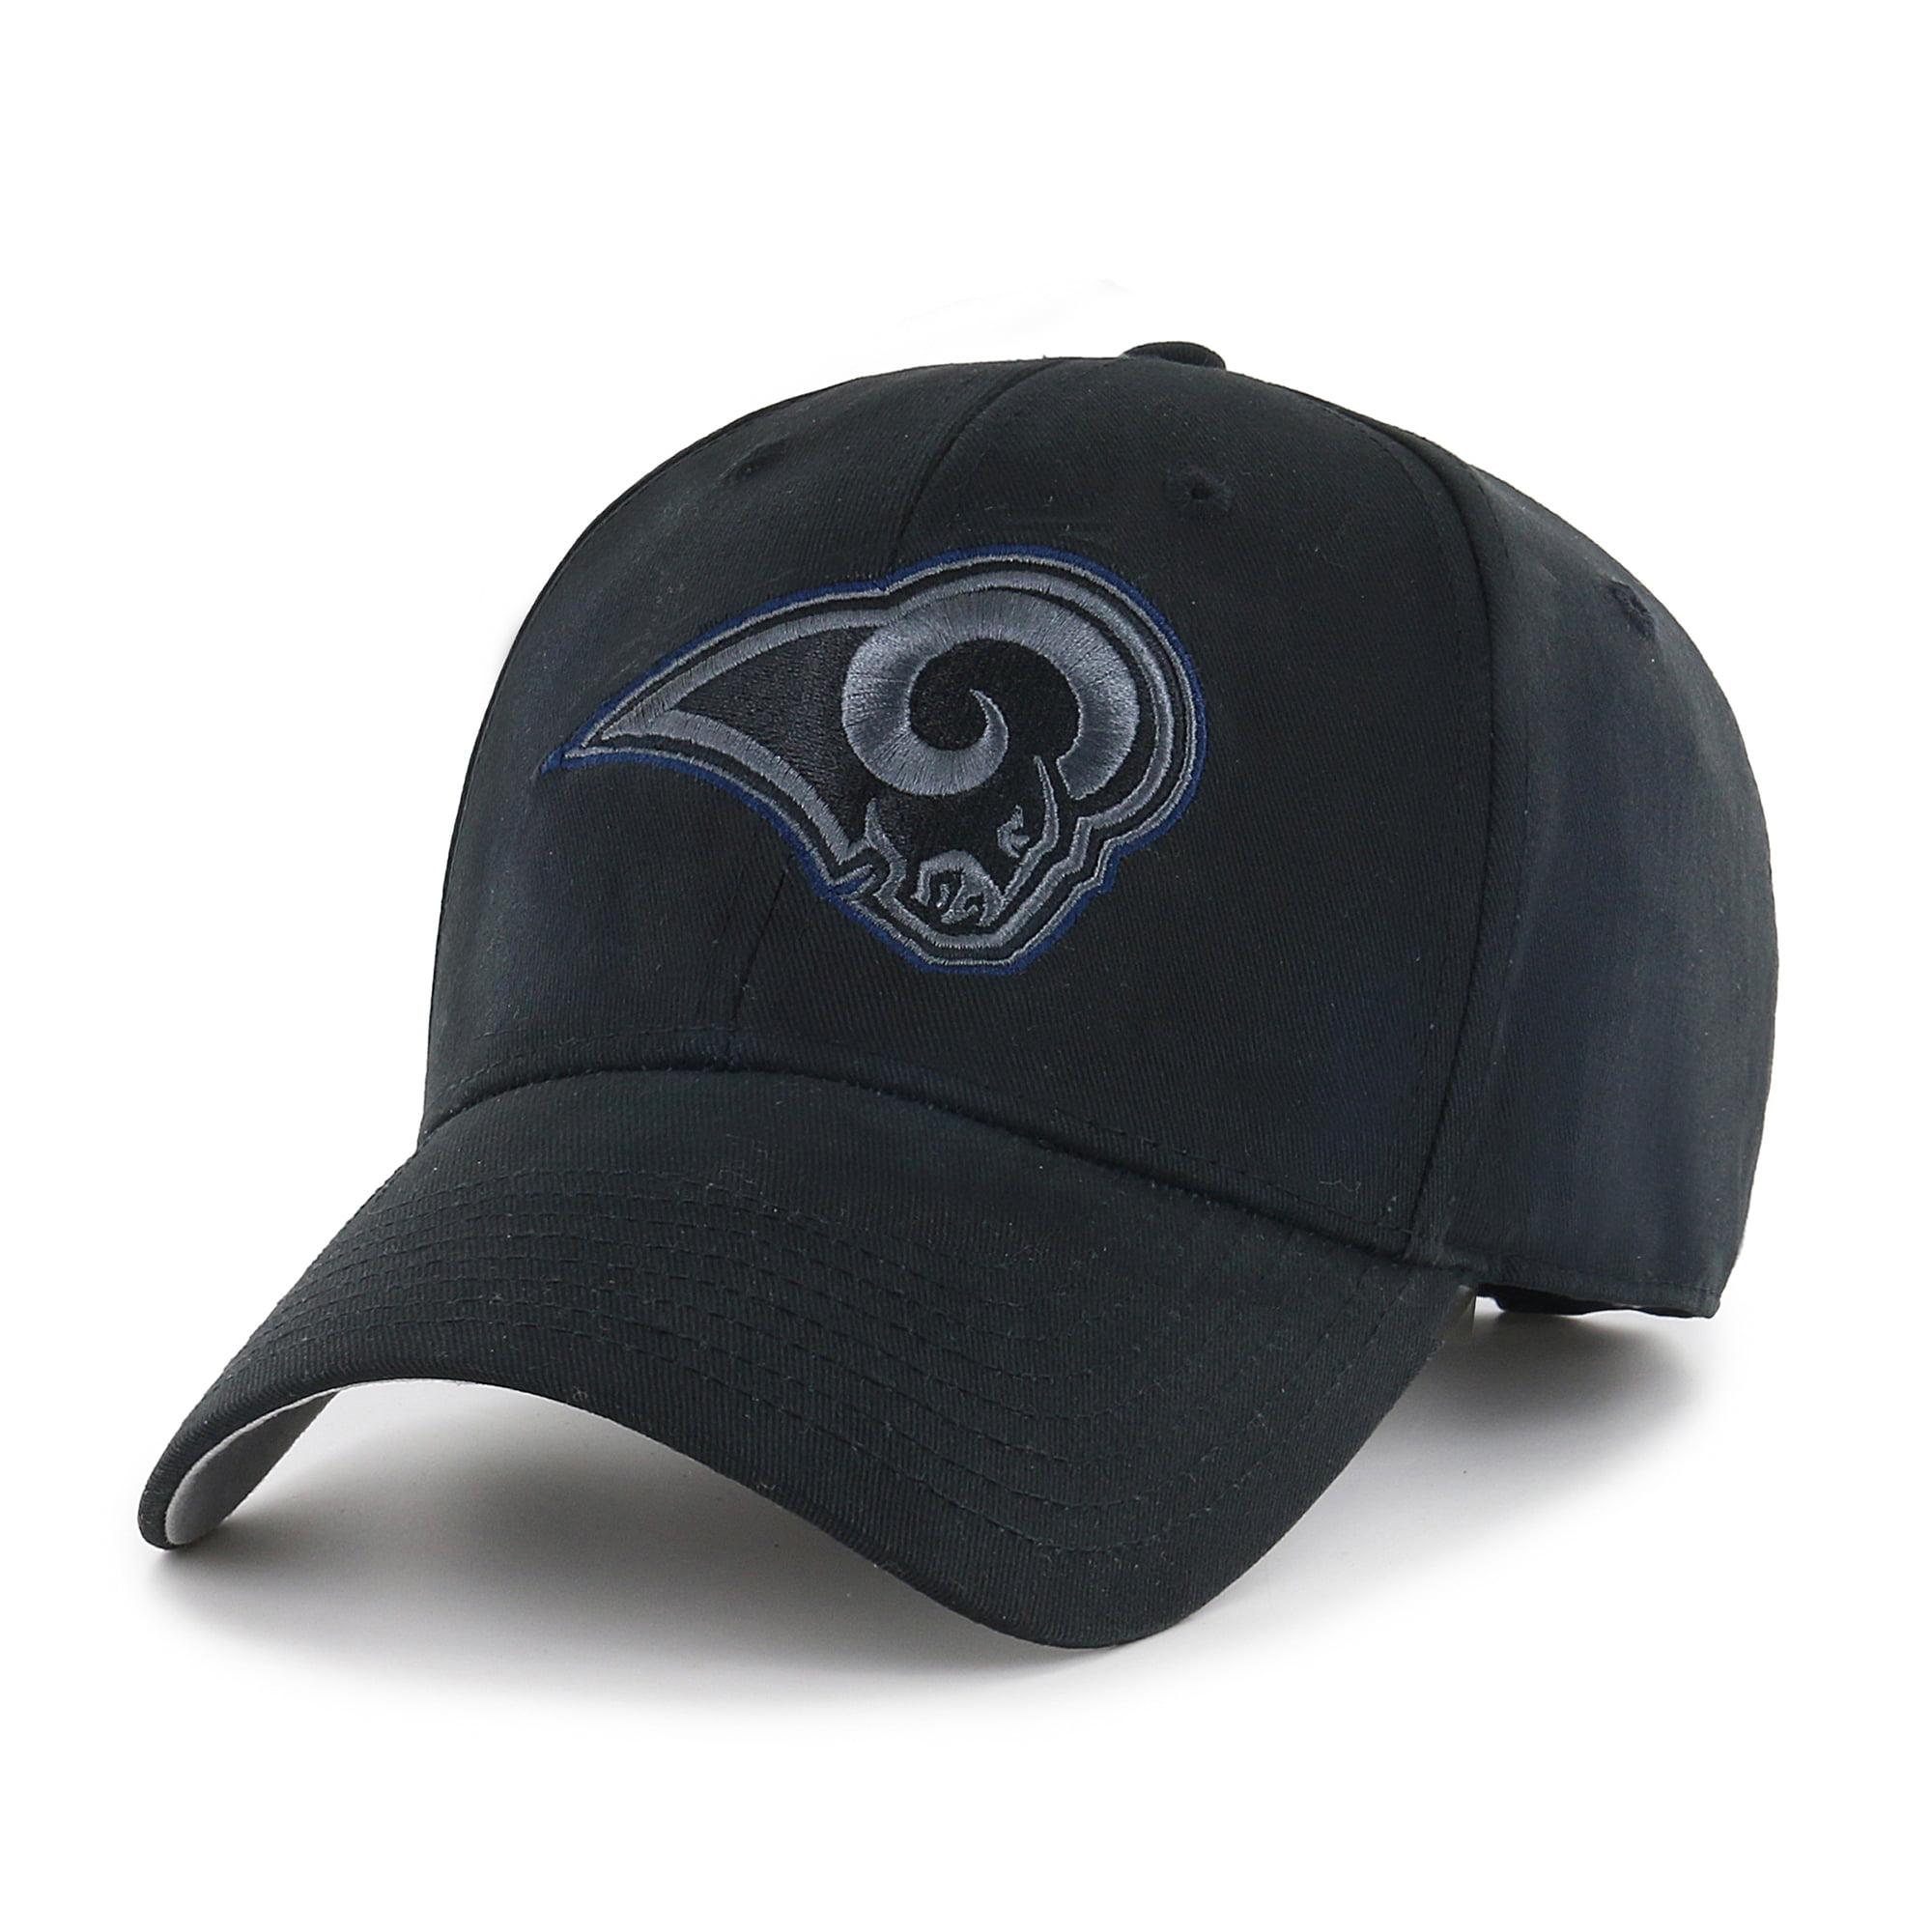 NFL Los Angeles Rams Black Mass Basic Adjustable Cap/Hat by Fan Favorite